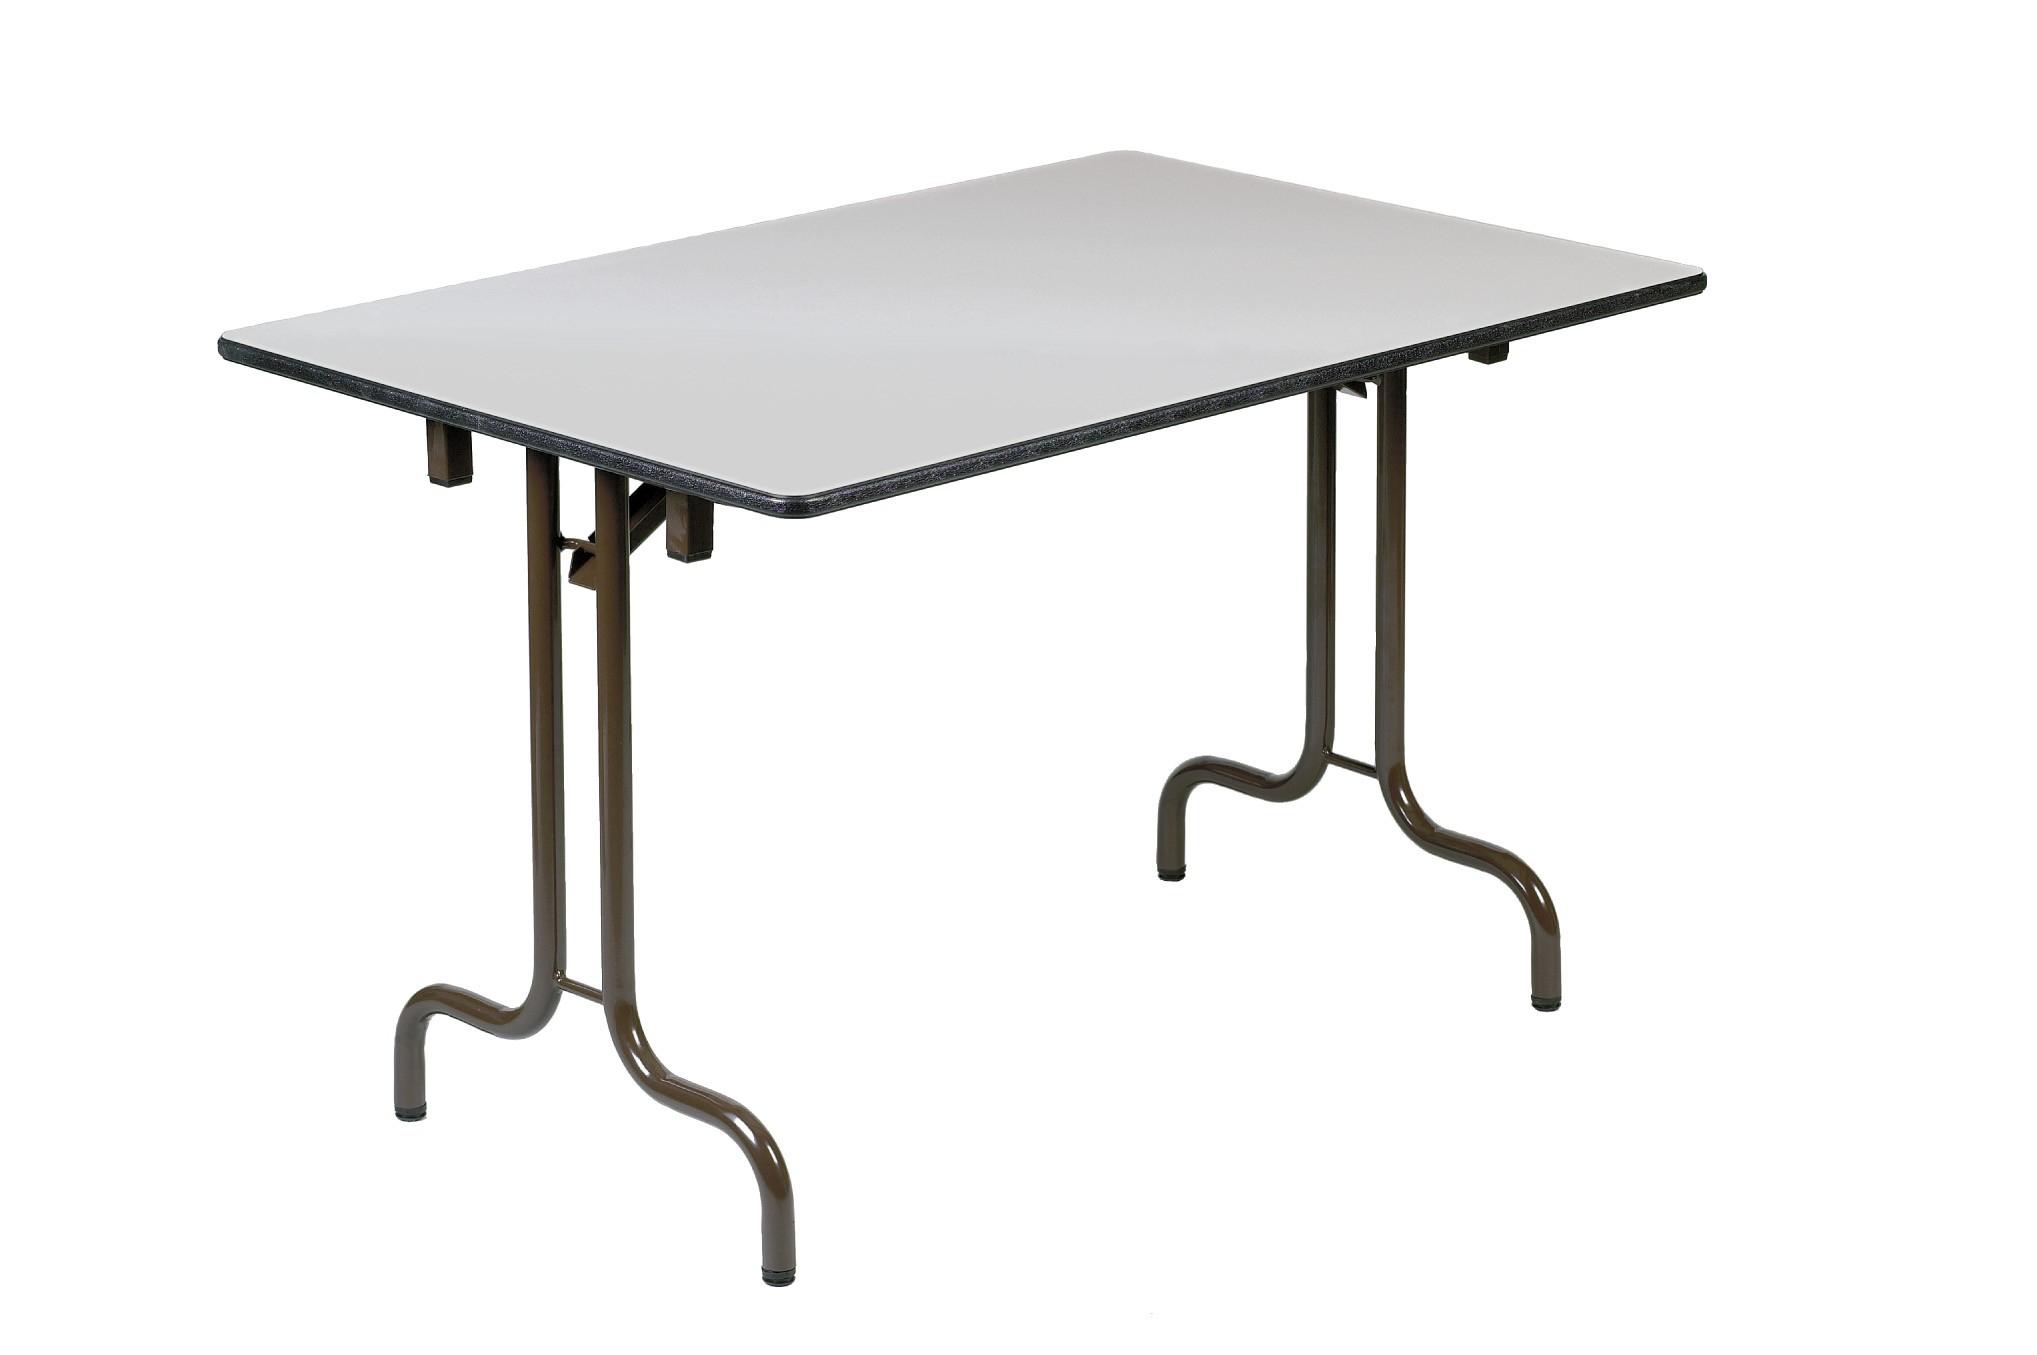 Chaise Centrakor De Jardin Home Brillant Table Pliante ... tout Table De Jardin Centrakor